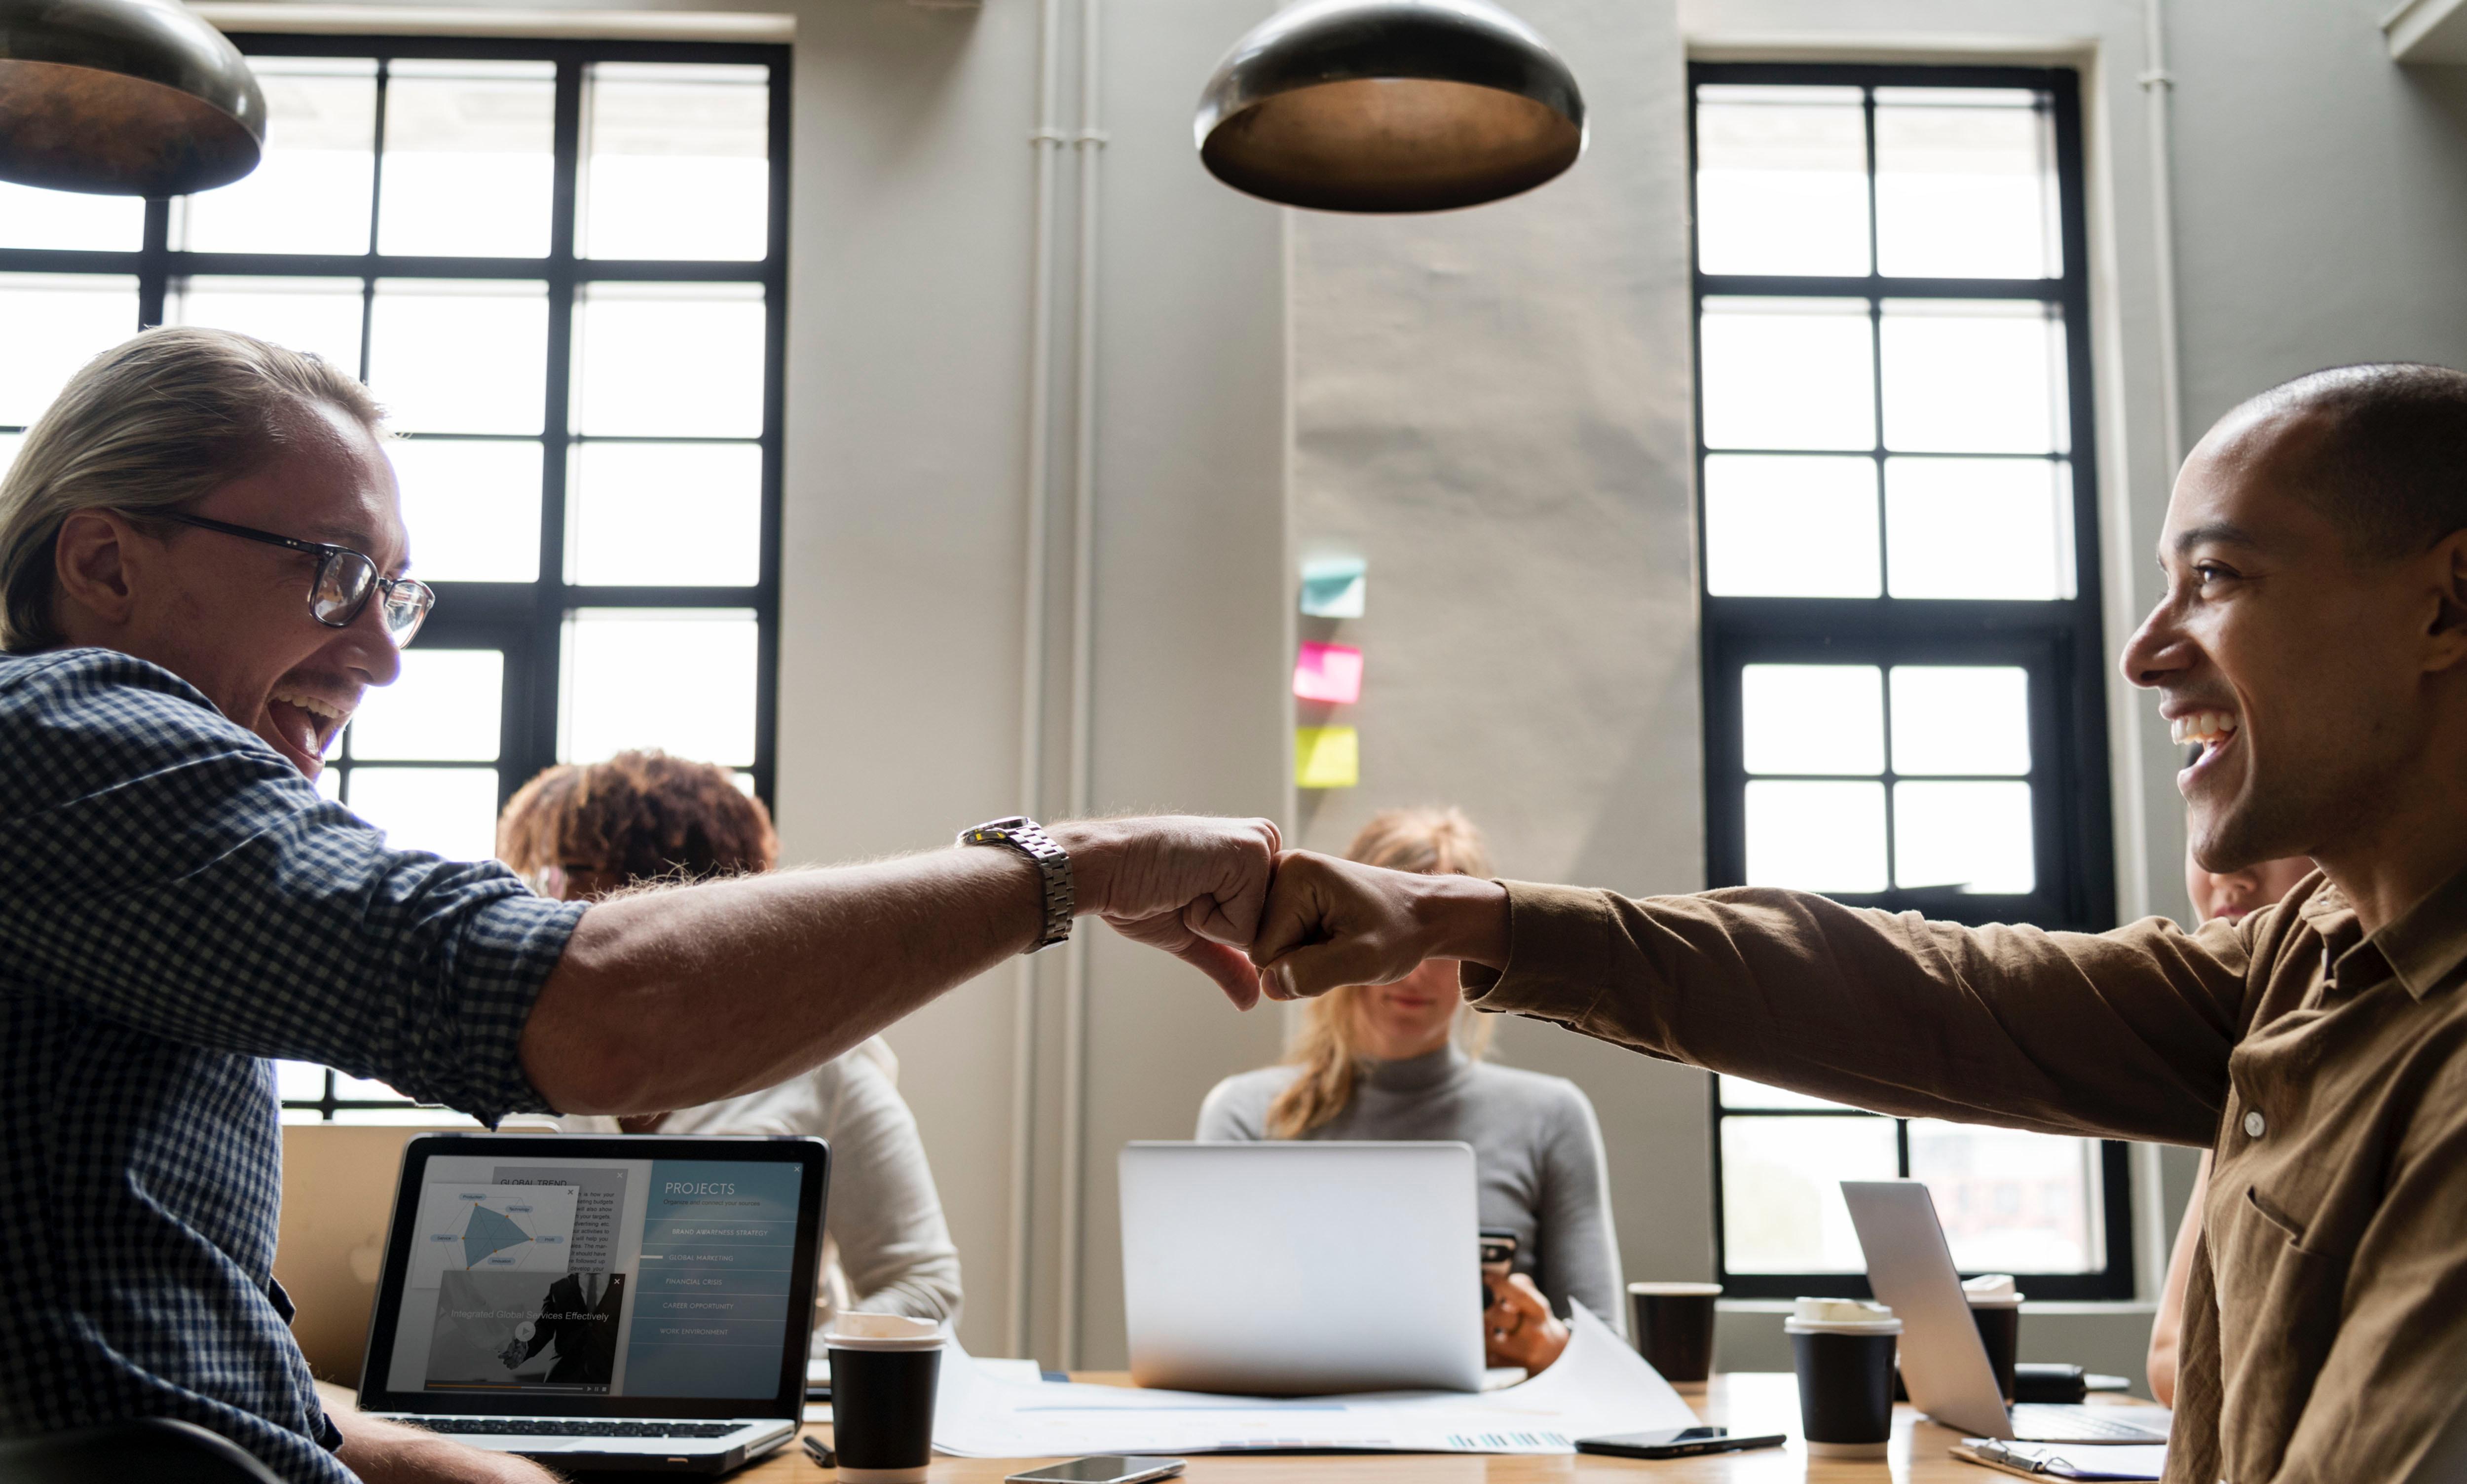 Free Images : achievement, adults, agreement, arms, collaboration,  colleagues, communication, computers, connection, desk, facial expression,  fist bump, ...